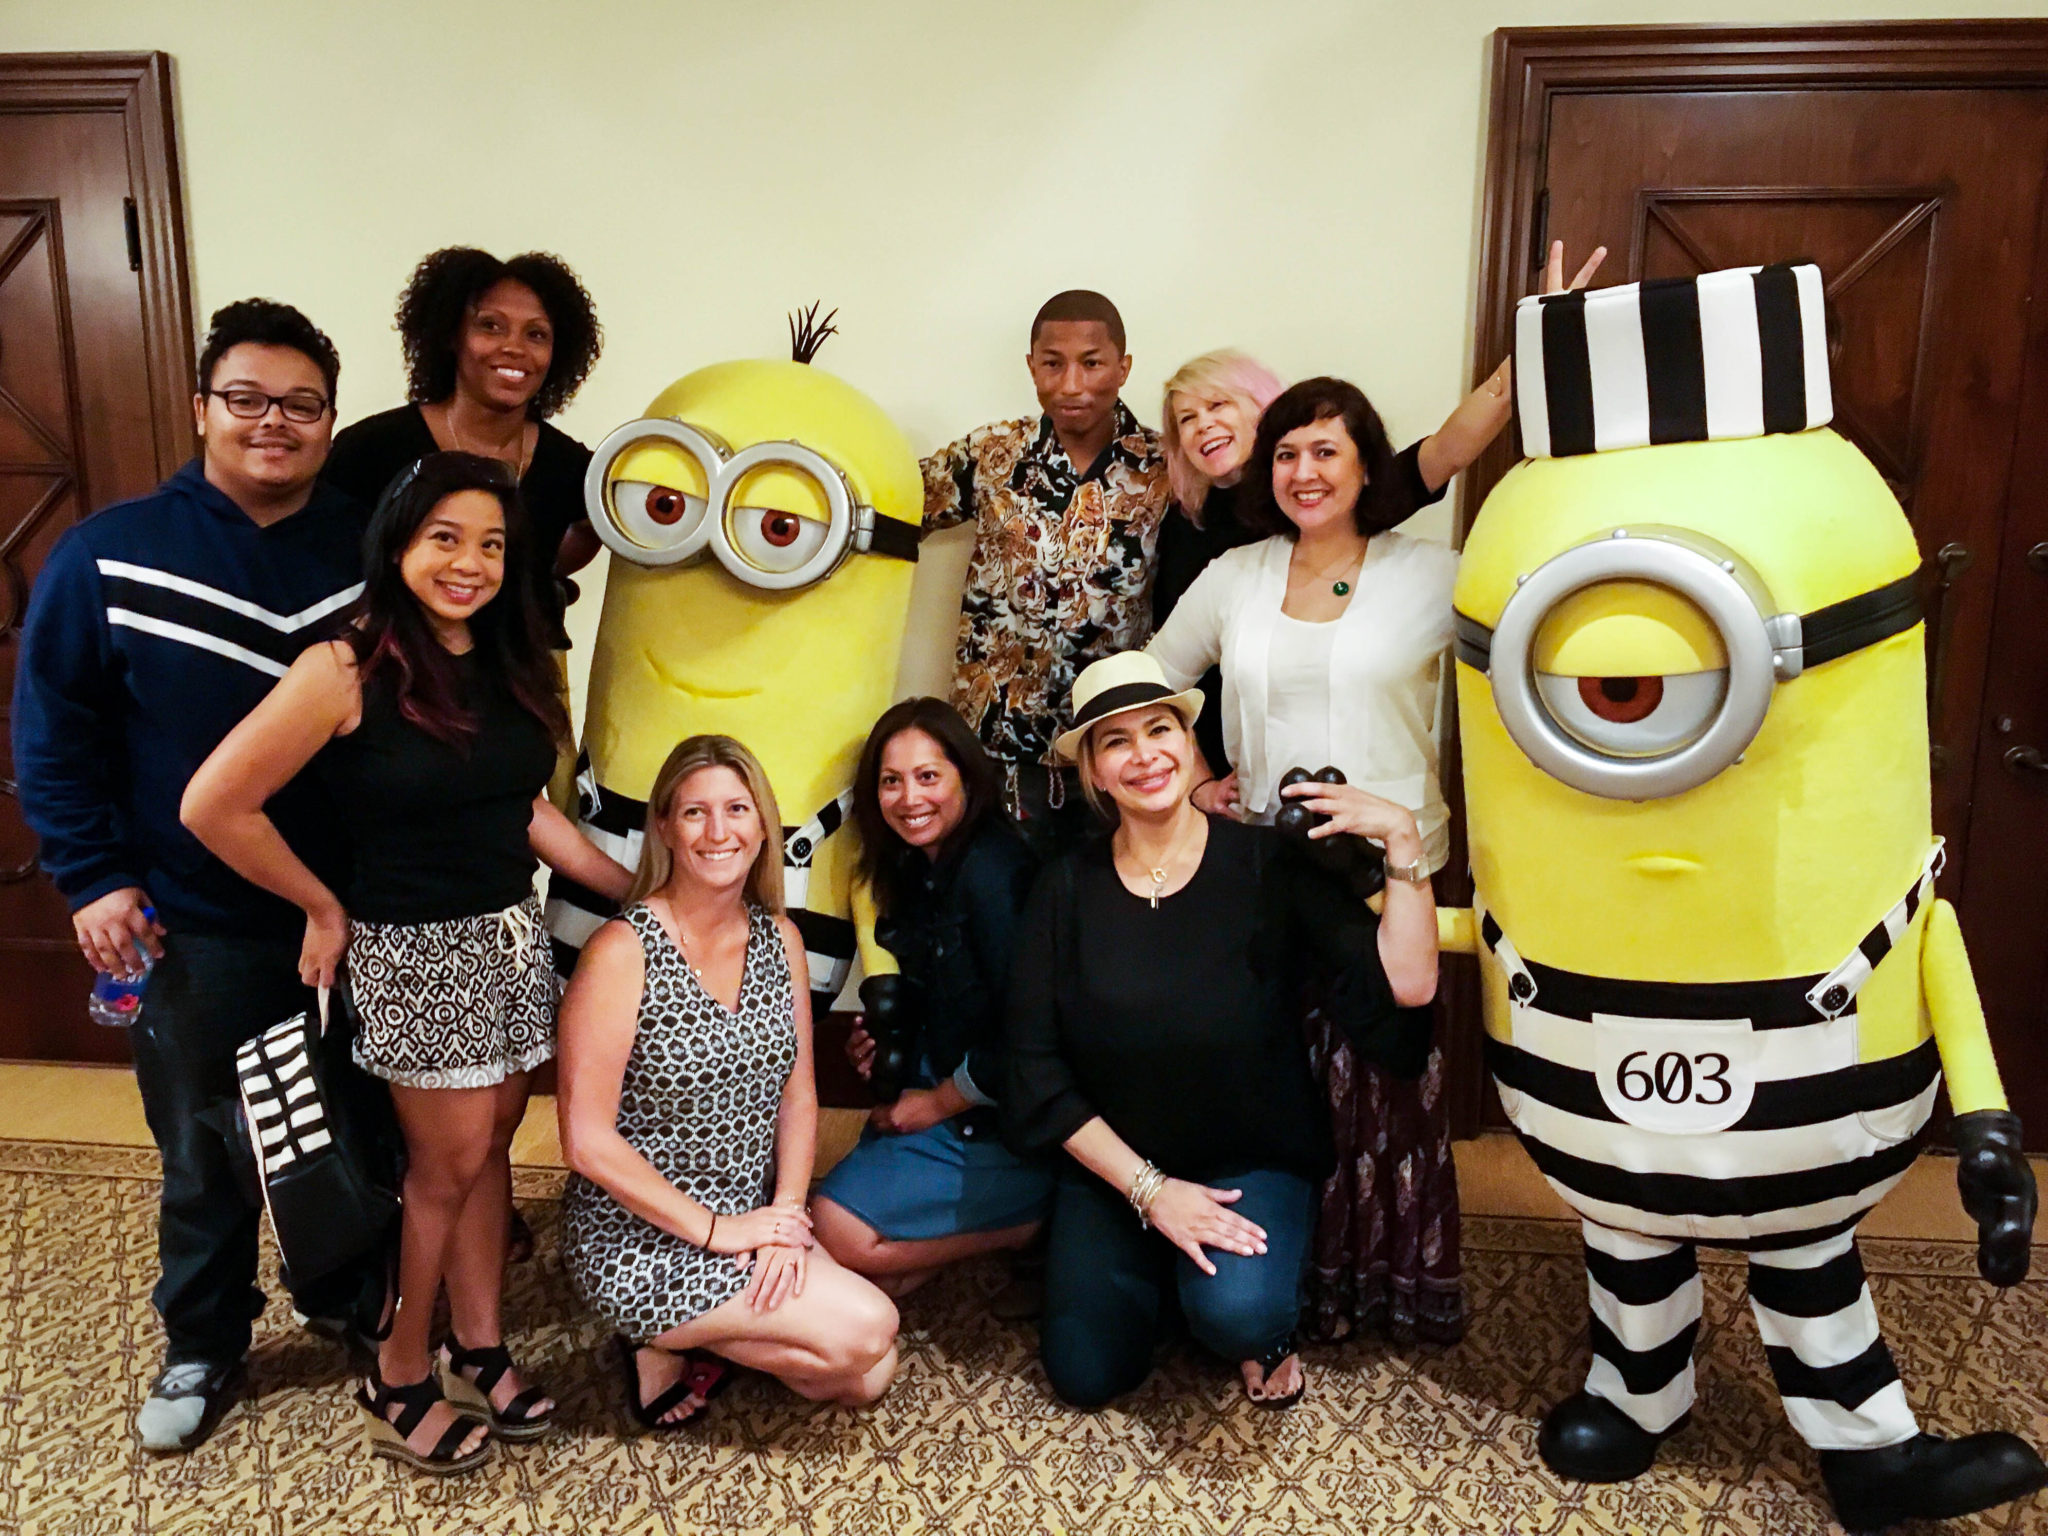 Pharrell Williams - Despicable-Me-3-Cast-Interviews-3 - Universal Pictures Despicable Me 3 Press Junket